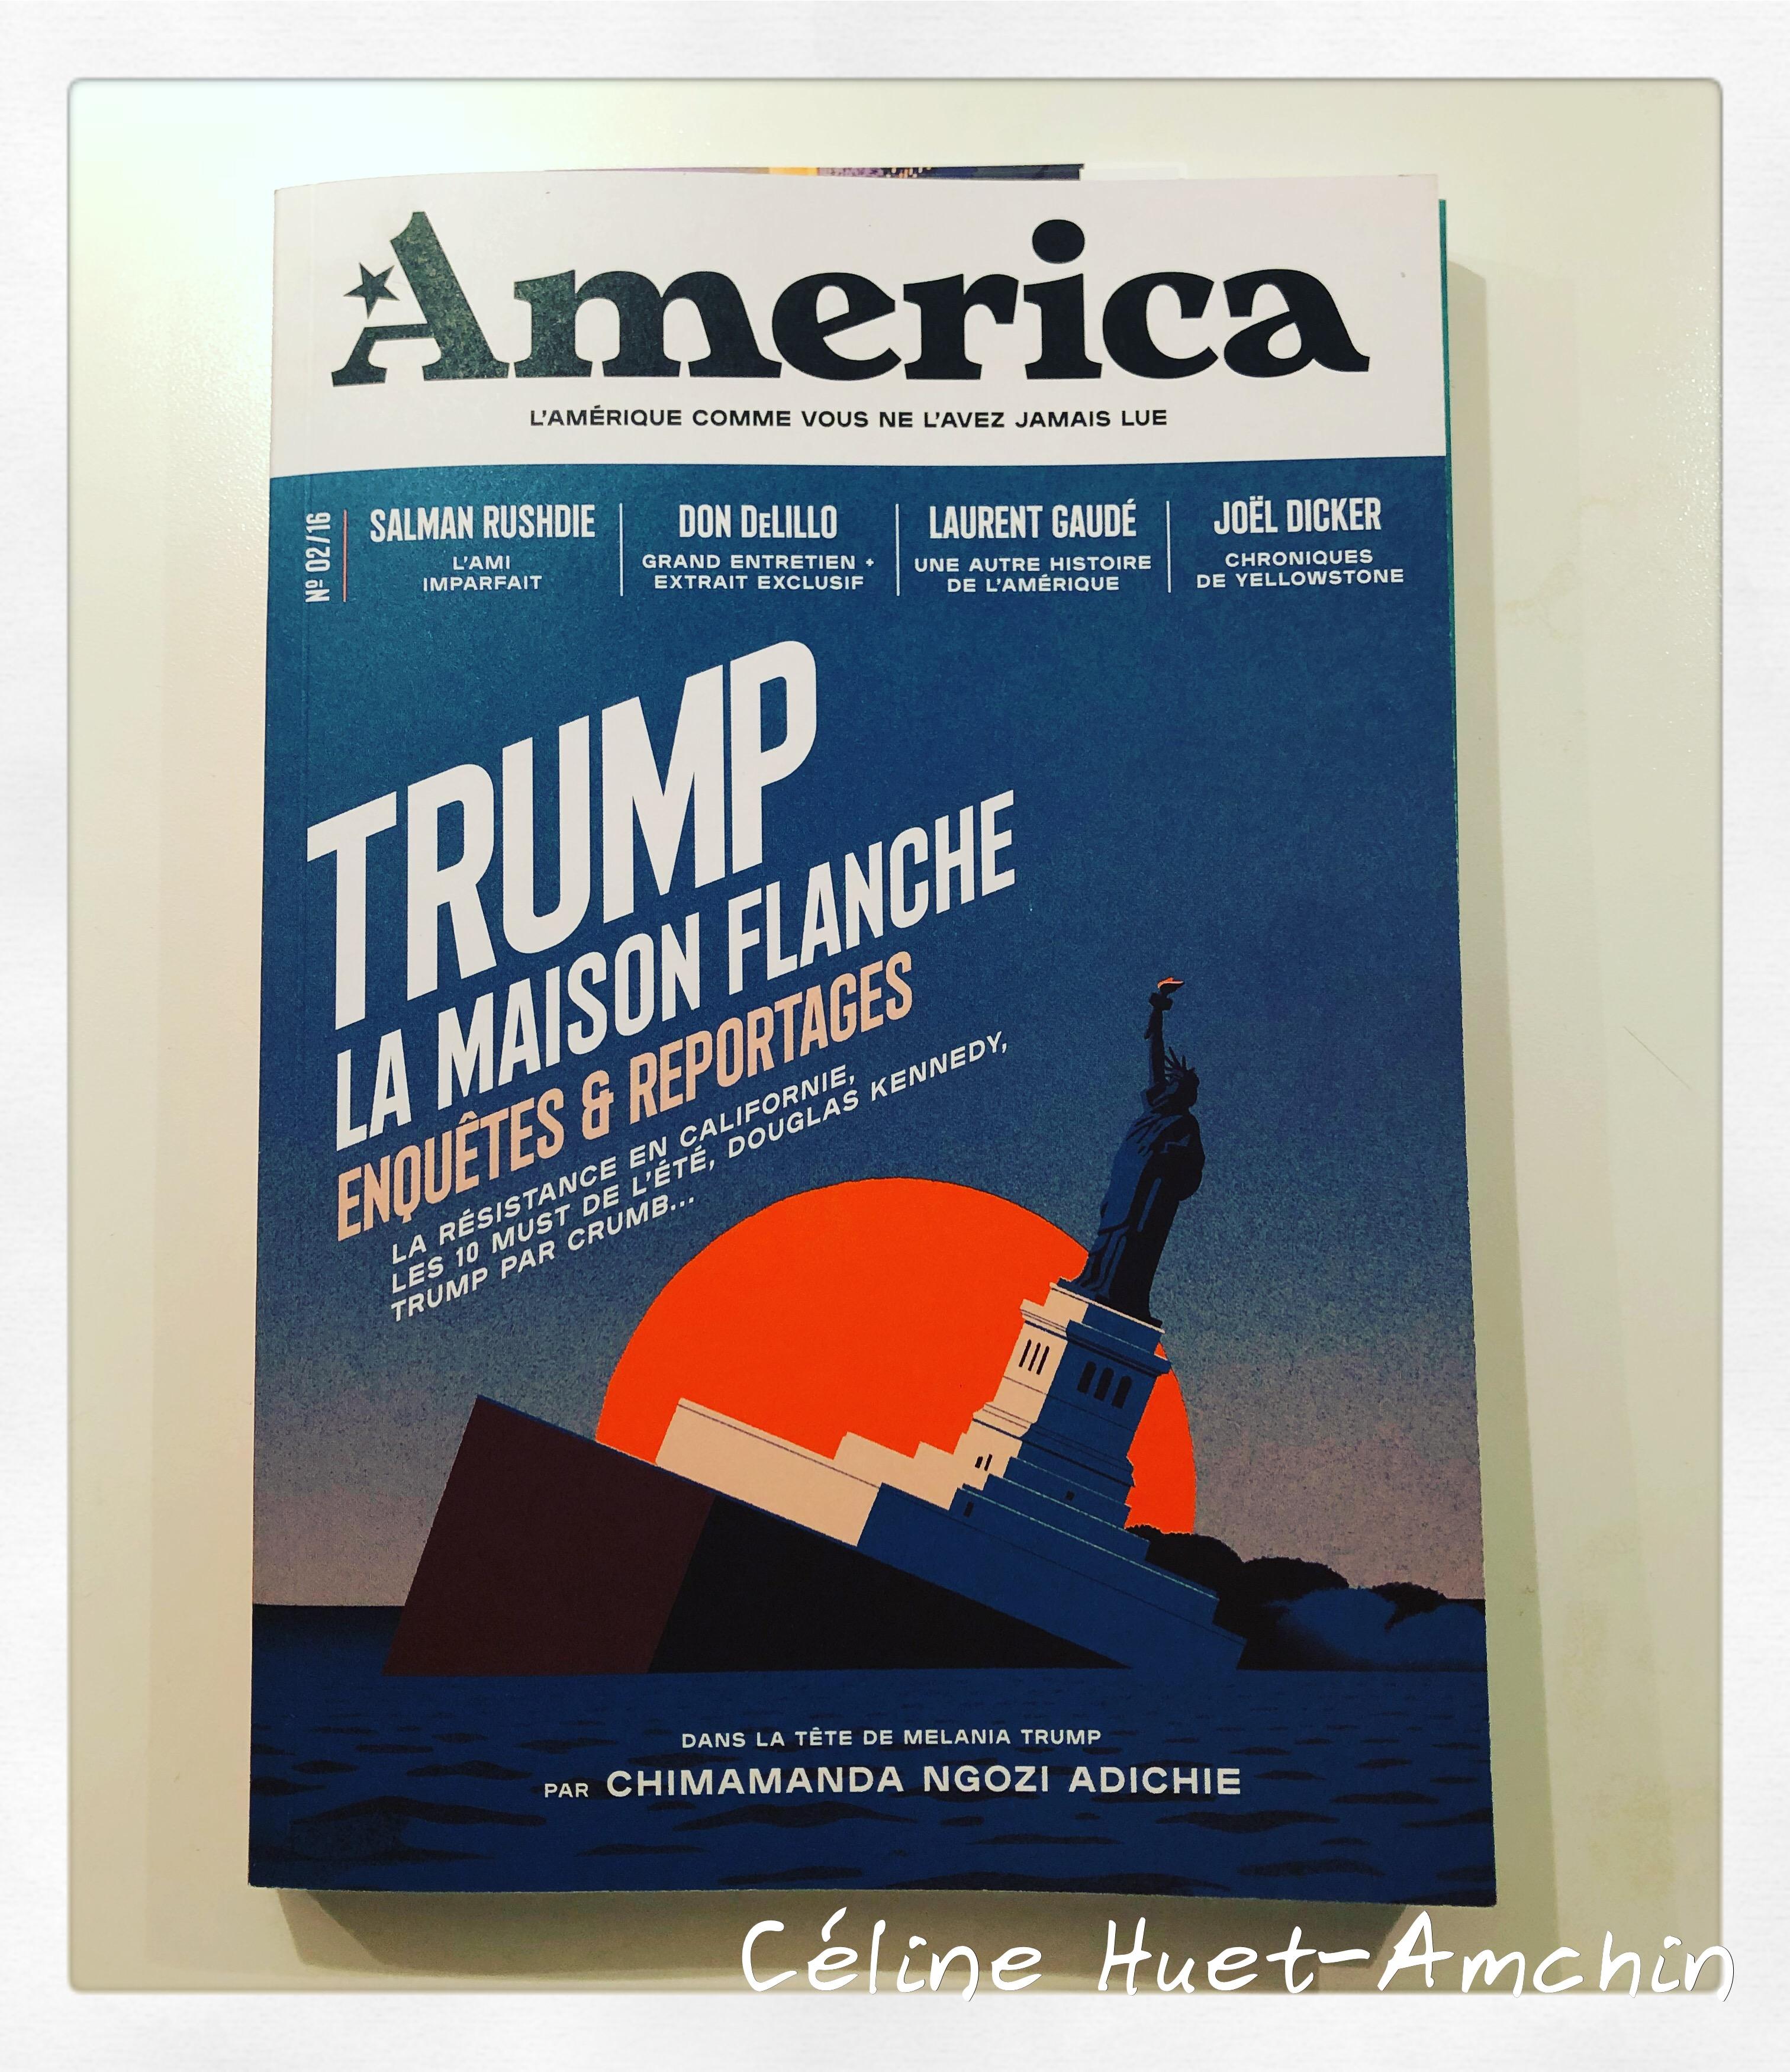 America Busnel Fottorino n° 2